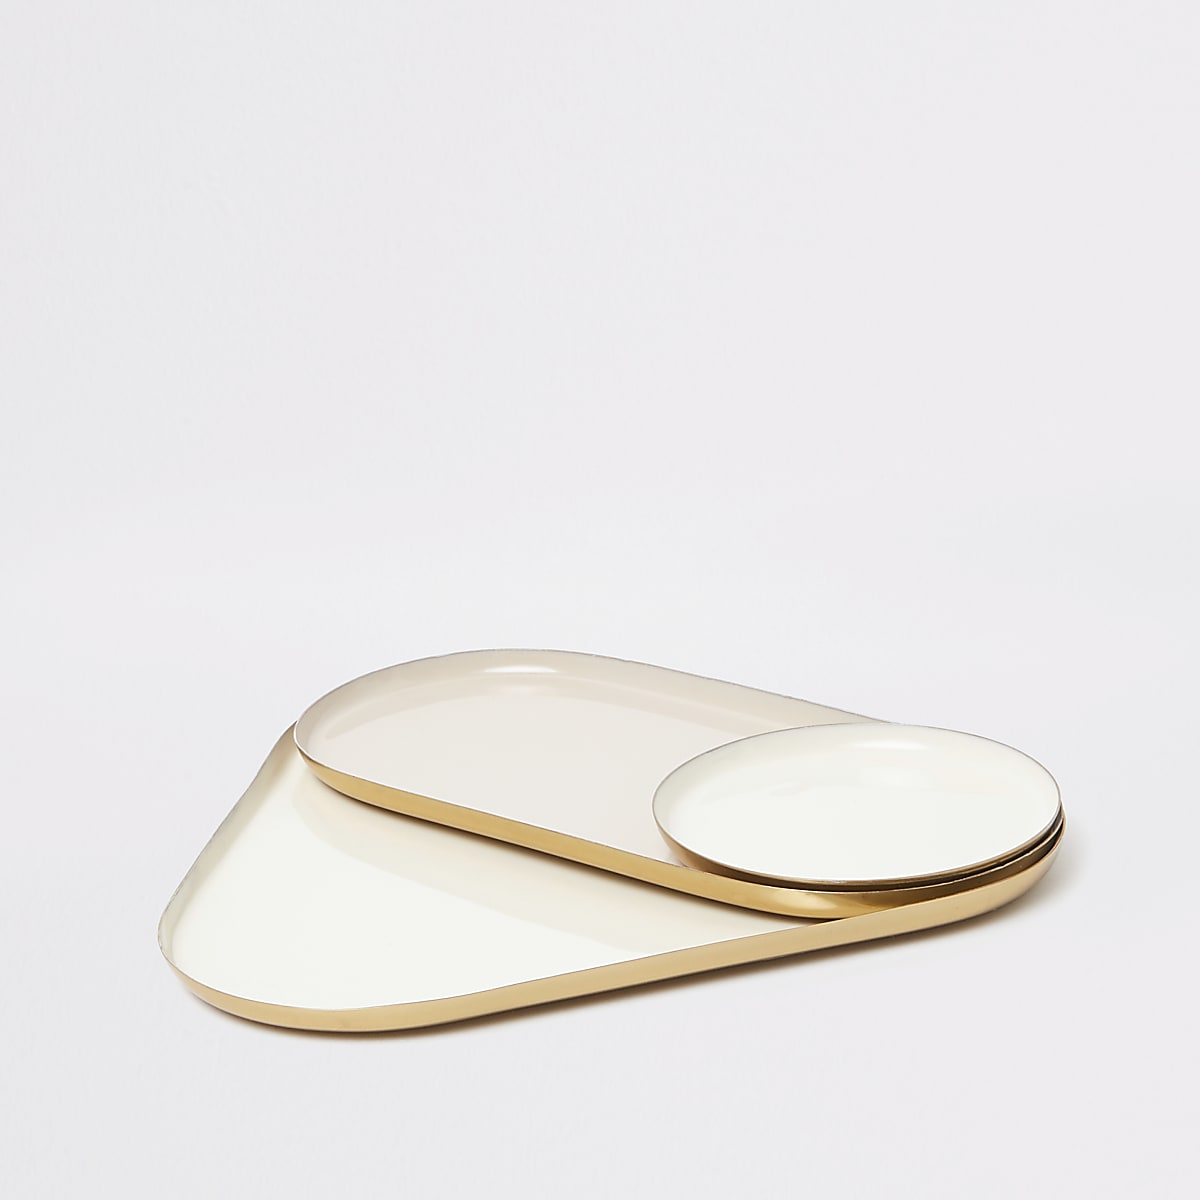 Set of 3 cream high shine classic tray